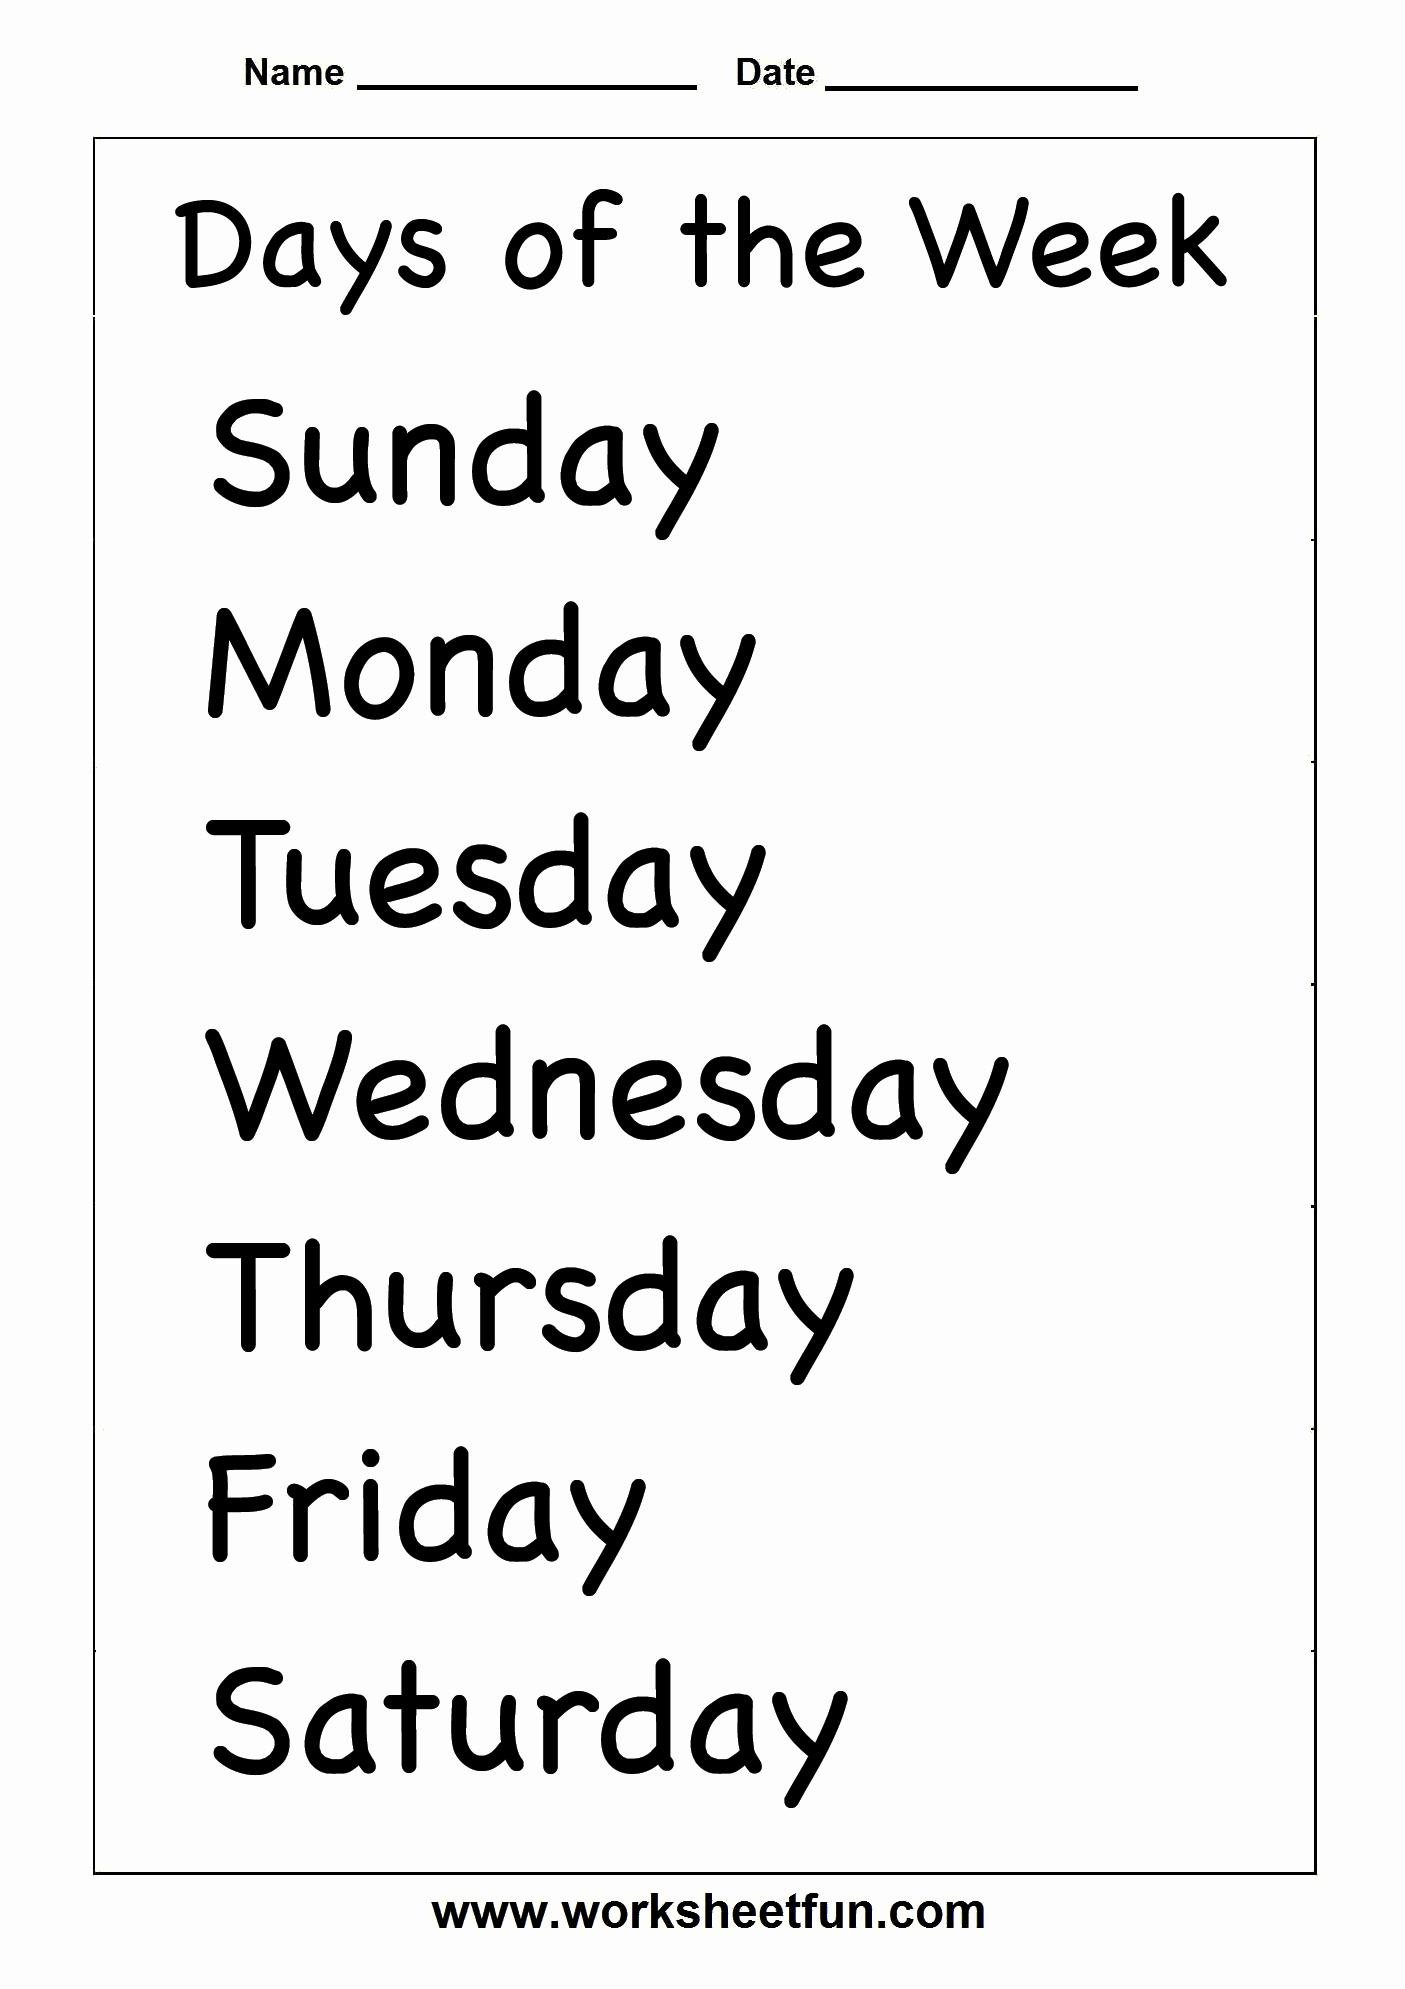 Days Of the Week Horizontal Beautiful Days Of the Week – 2 Worksheets Free Printable